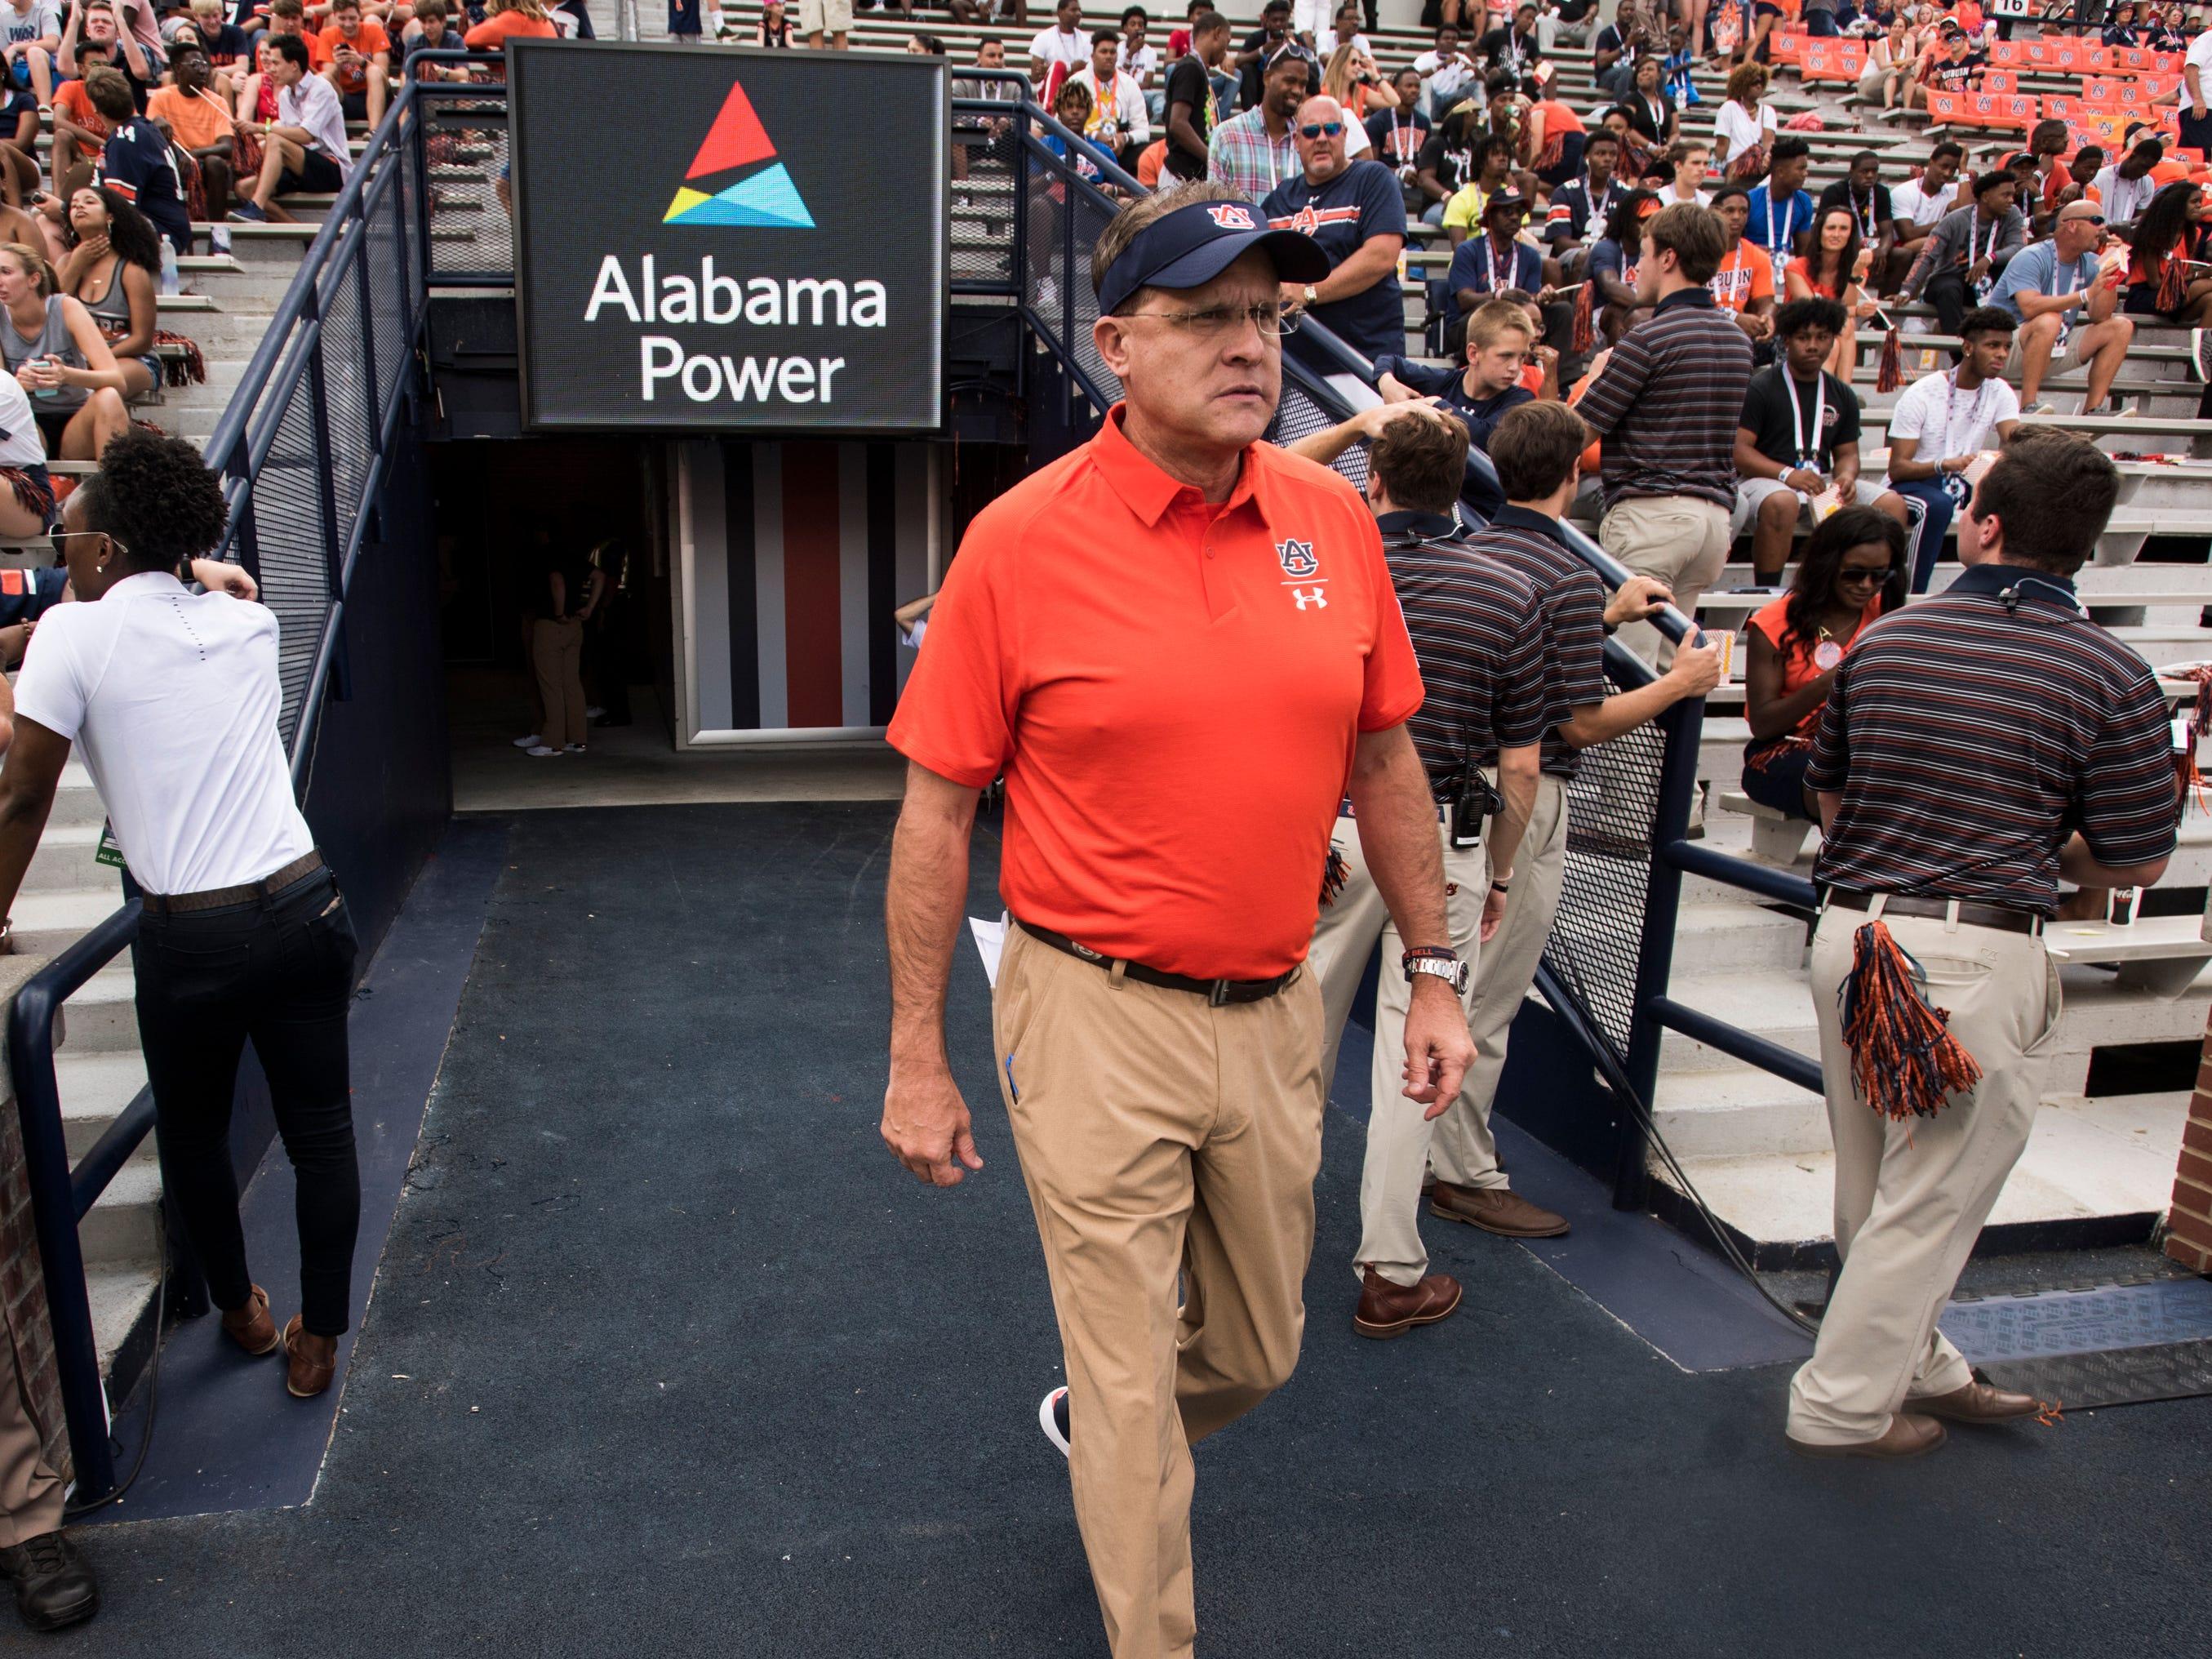 Auburn head coach Gus Malzahn takes the field for warm ups before his team takes on Southern Miss at Jordan-Hare Stadium in Auburn, Ala., on Saturday, Sept. 29, 2018. Auburn defeated  Southern Miss 24-13.